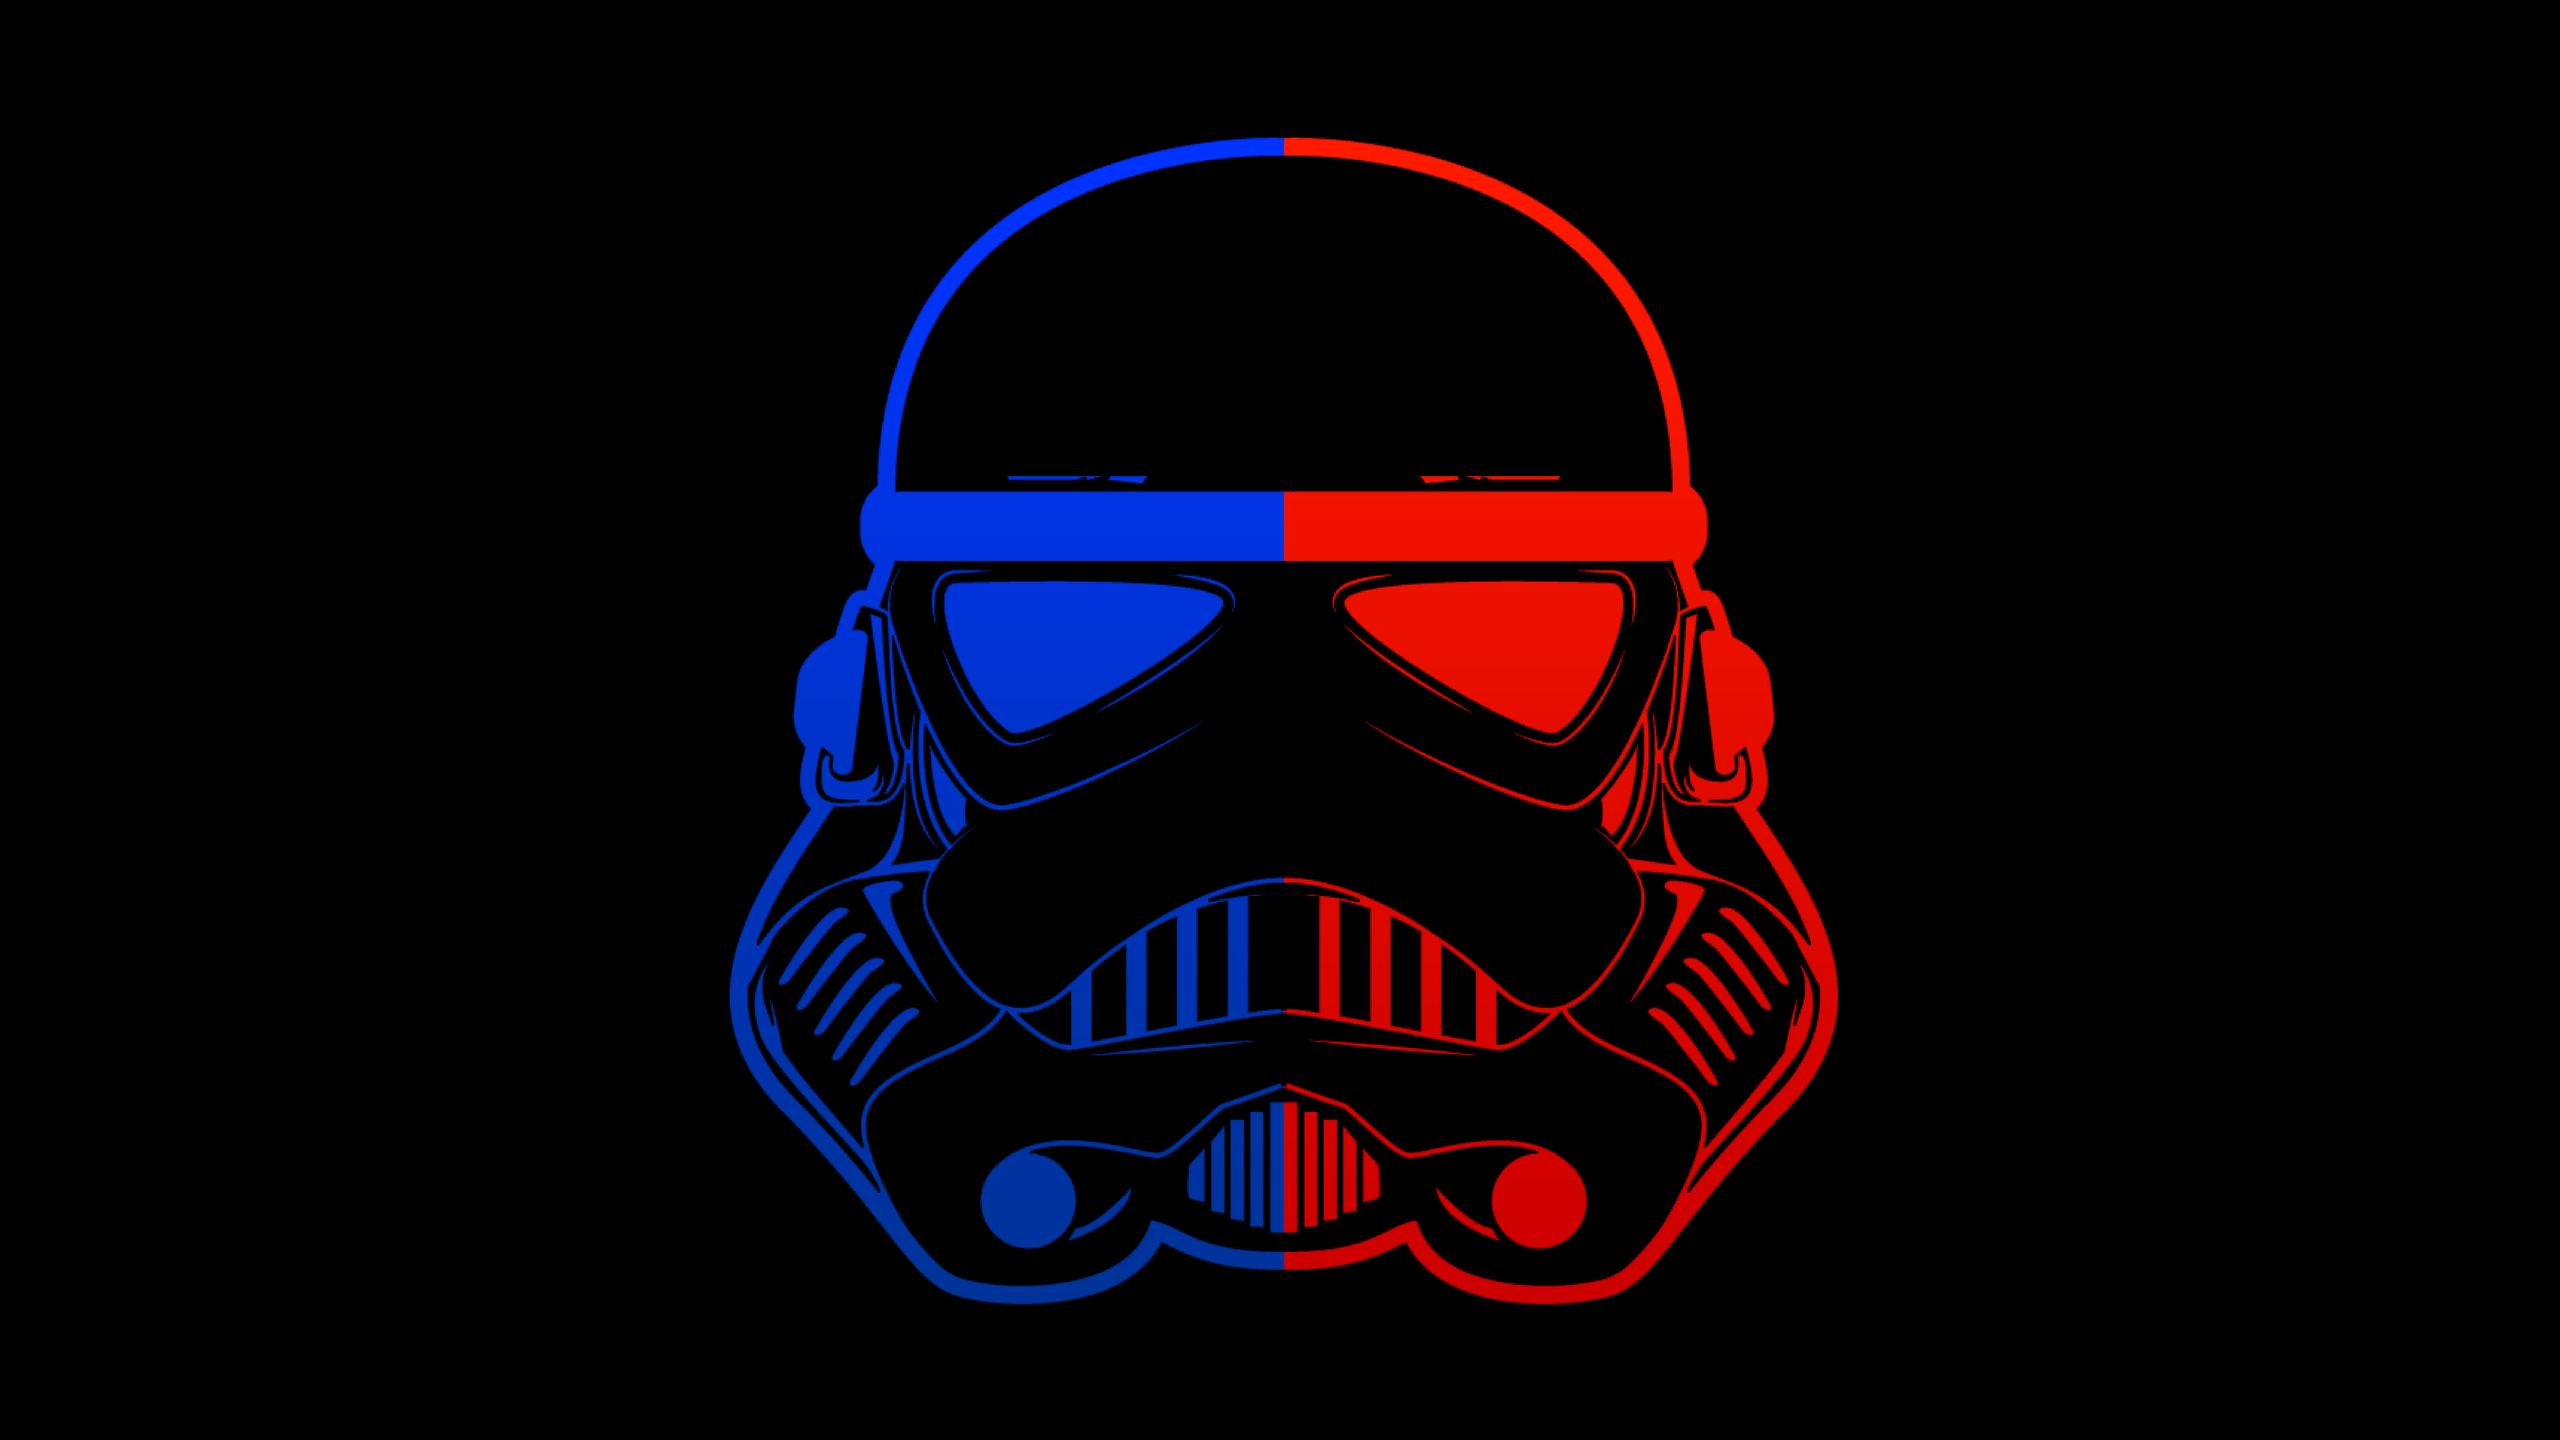 2560x1440 Stormtrooper Blue Red Mask Minimal 8k 1440P ...